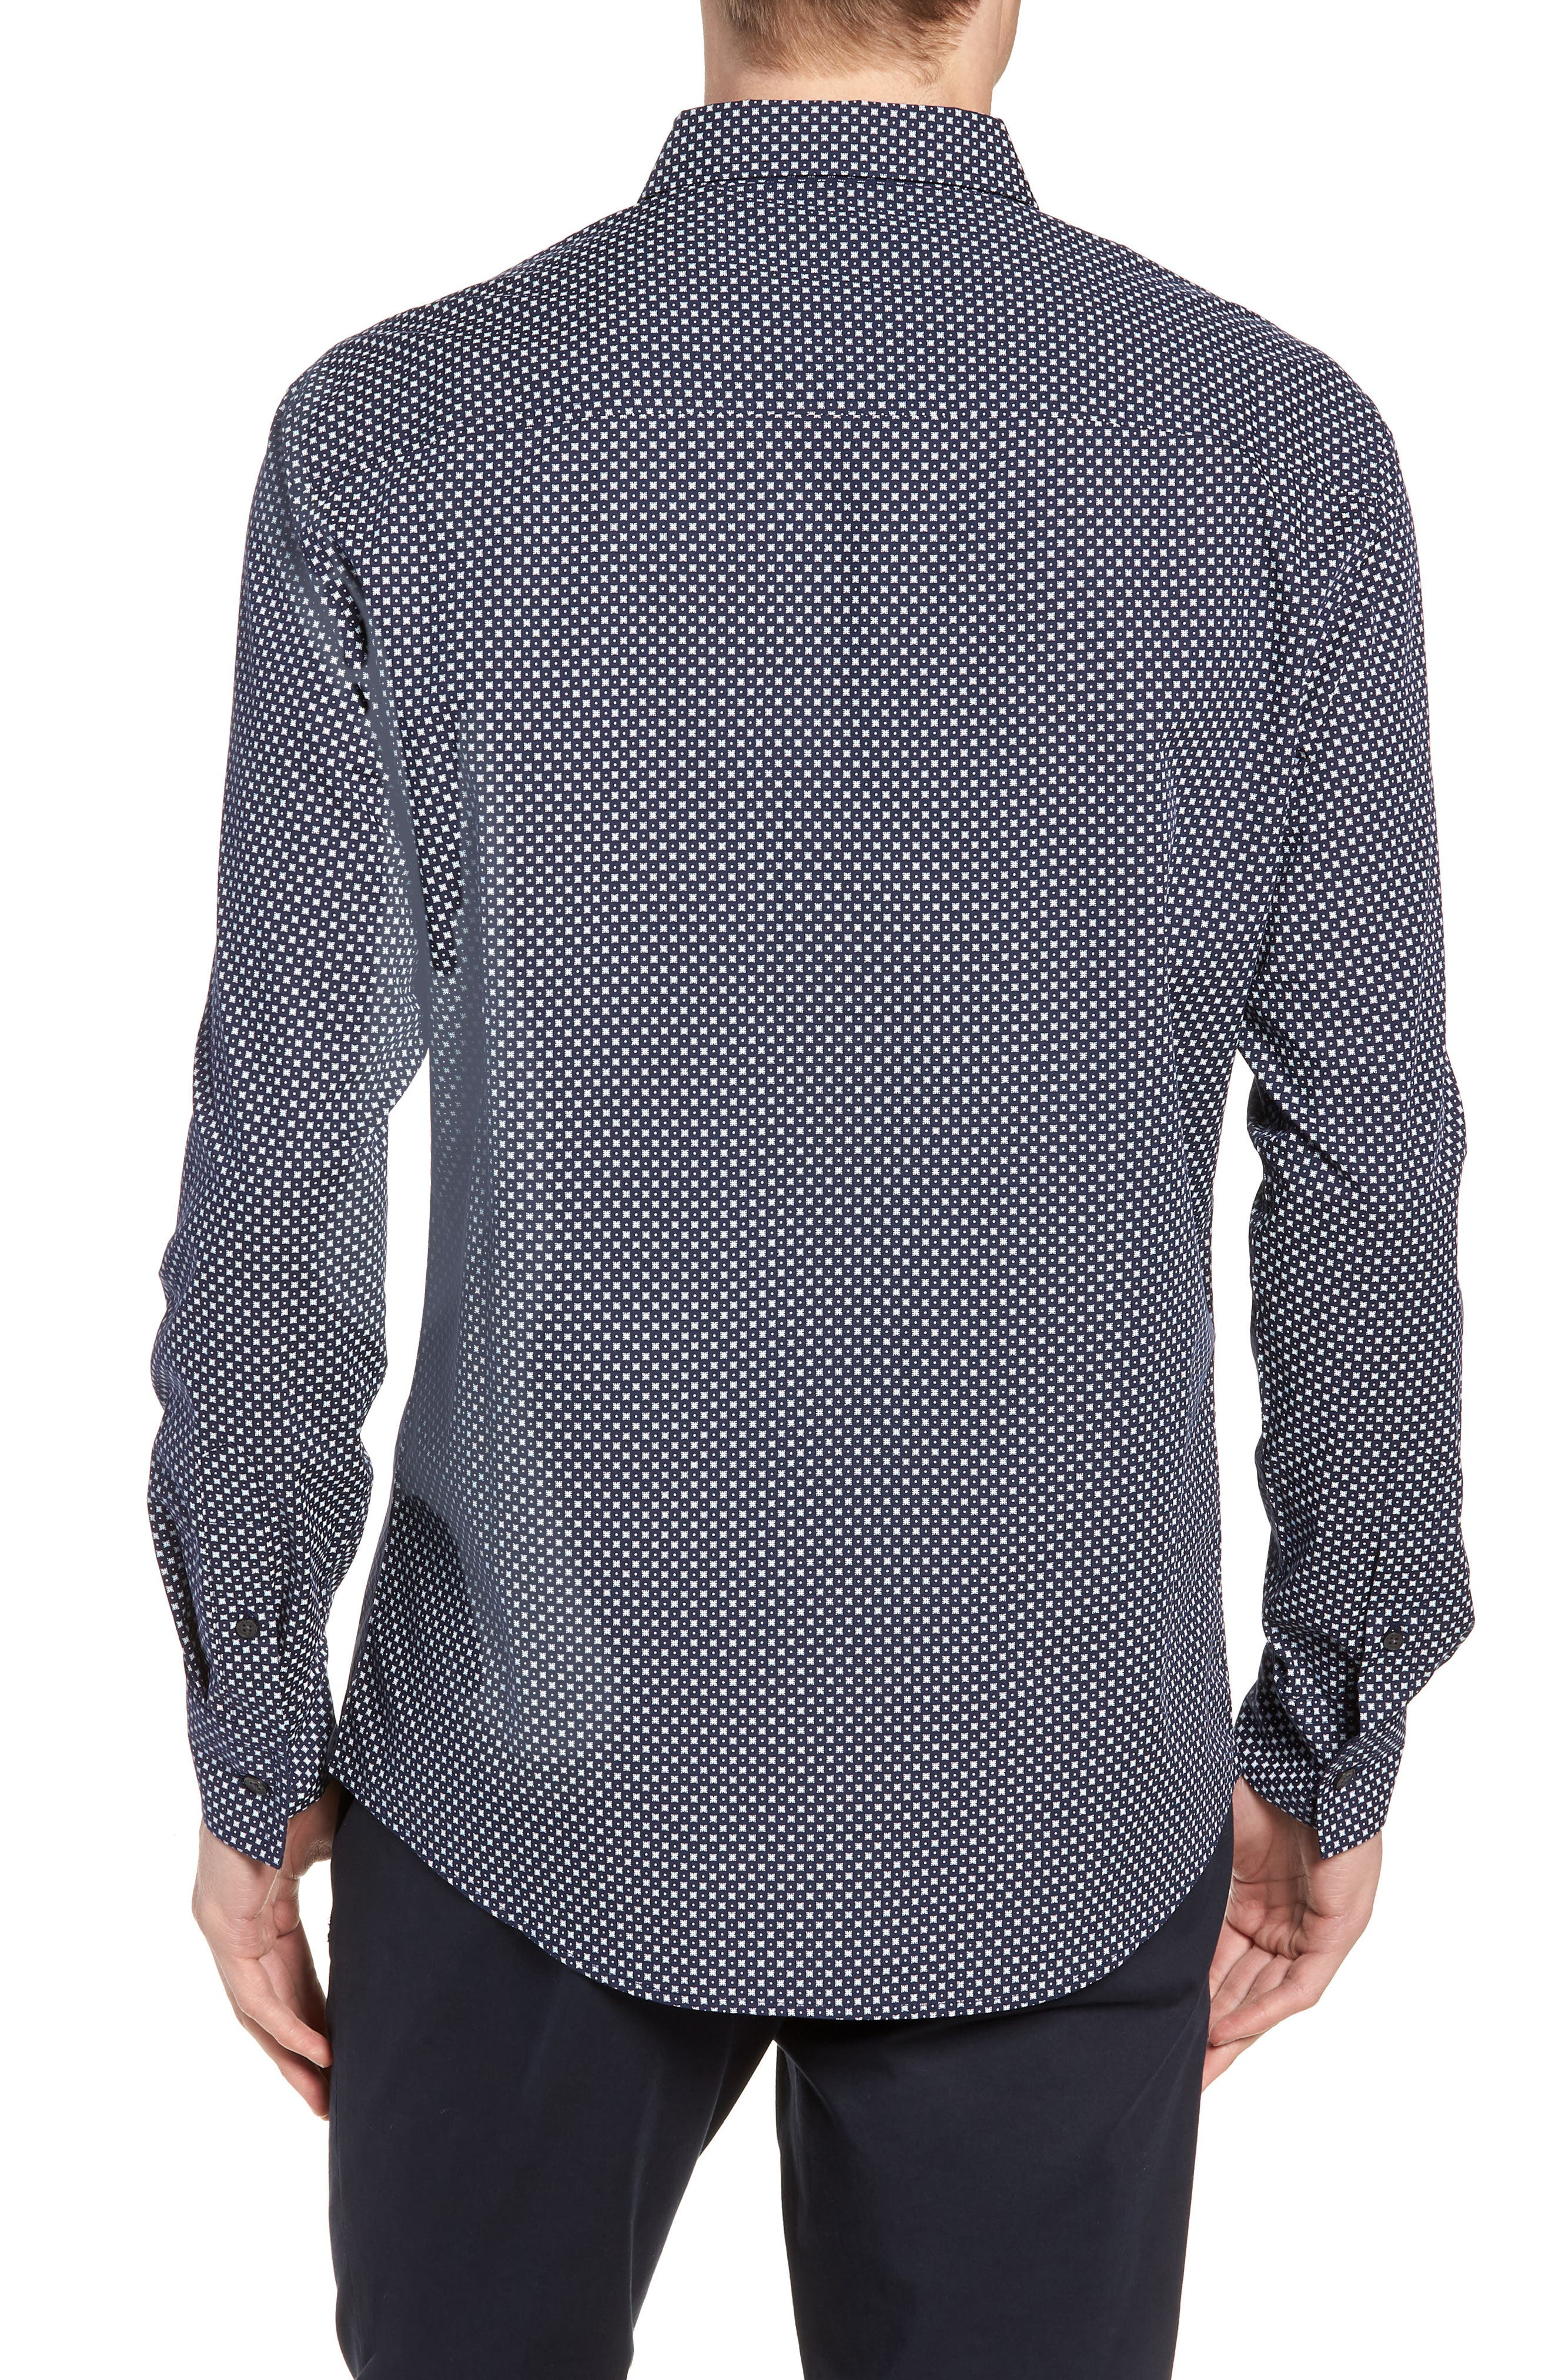 Regular Fit Geometric Dot Sport Shirt,                             Alternate thumbnail 3, color,                             NAVY/ WHITE POPLIN PRINT